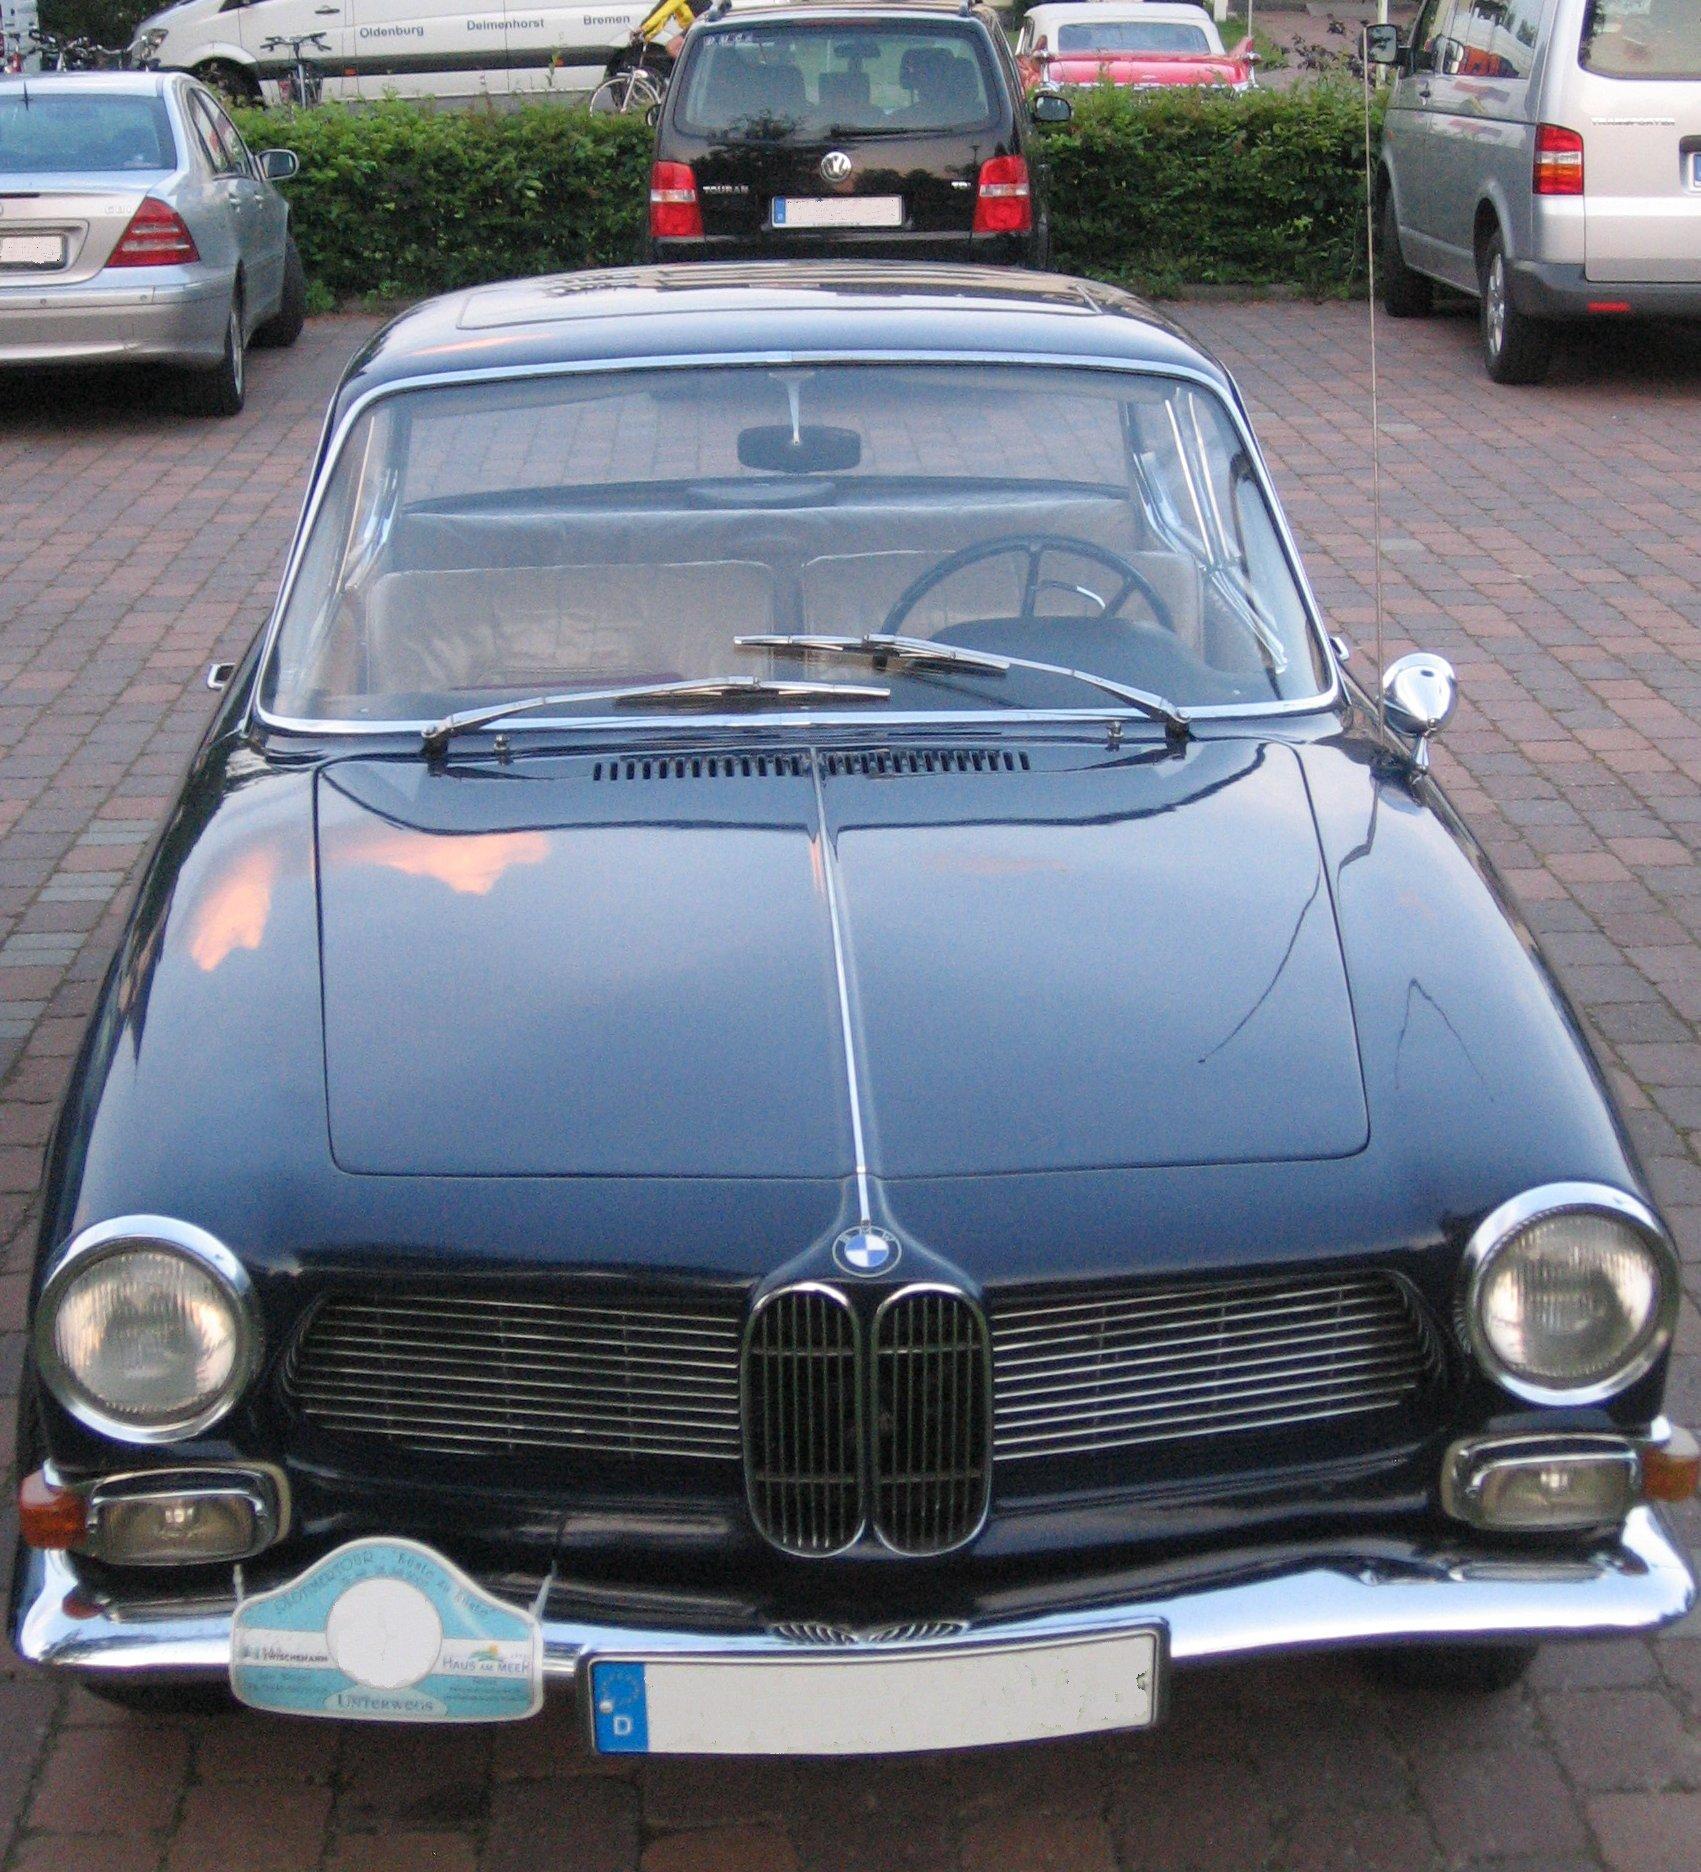 Archivo:BMW 3200 CS - front.jpg - Wikipedia, la enciclopedia libre